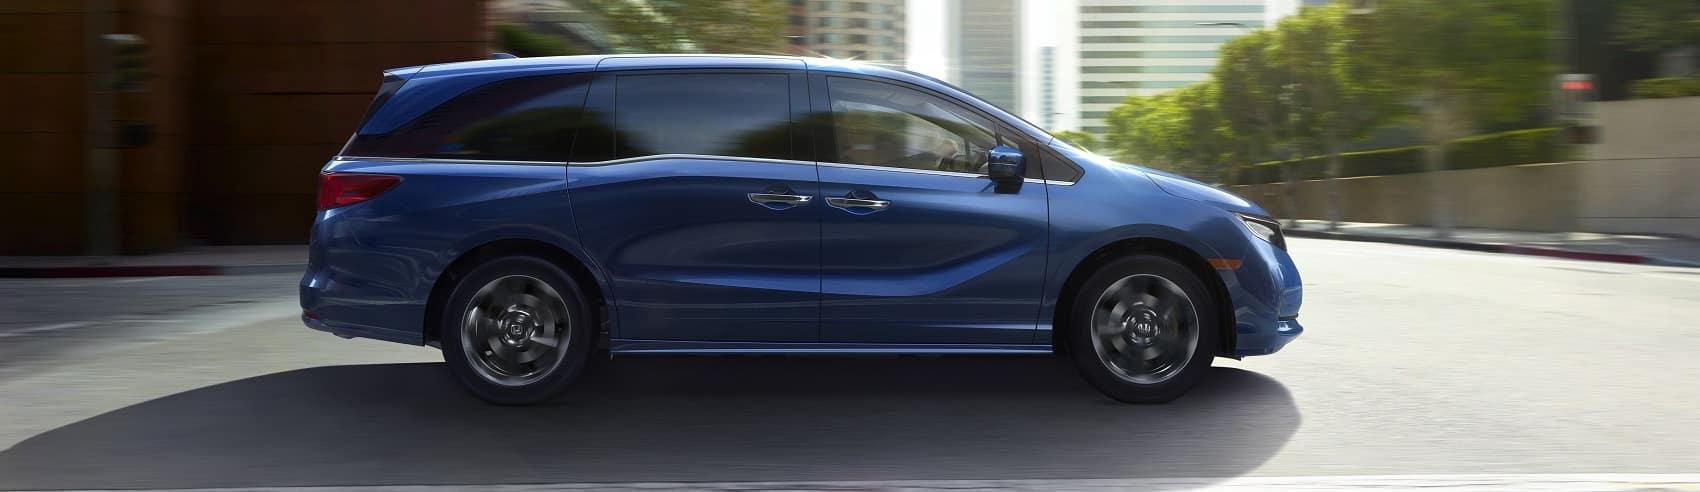 2021 Honda Odyssey Driving